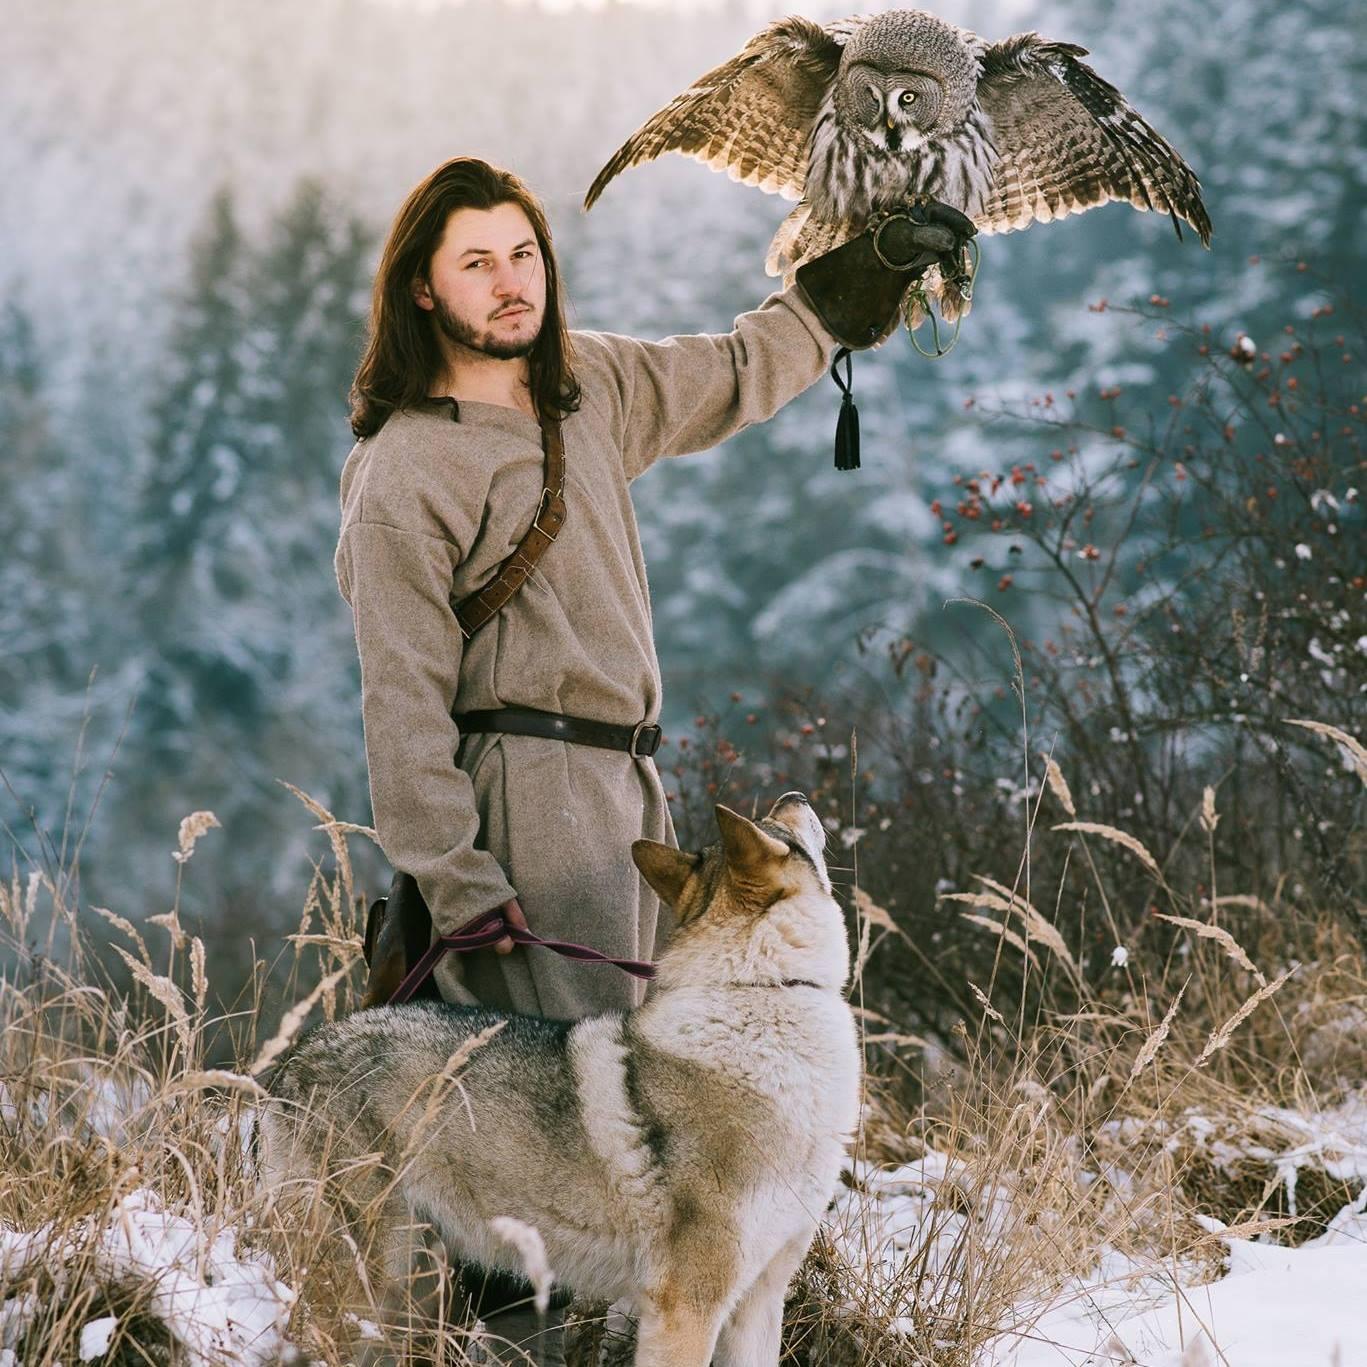 sokoliar so psom a sokolom